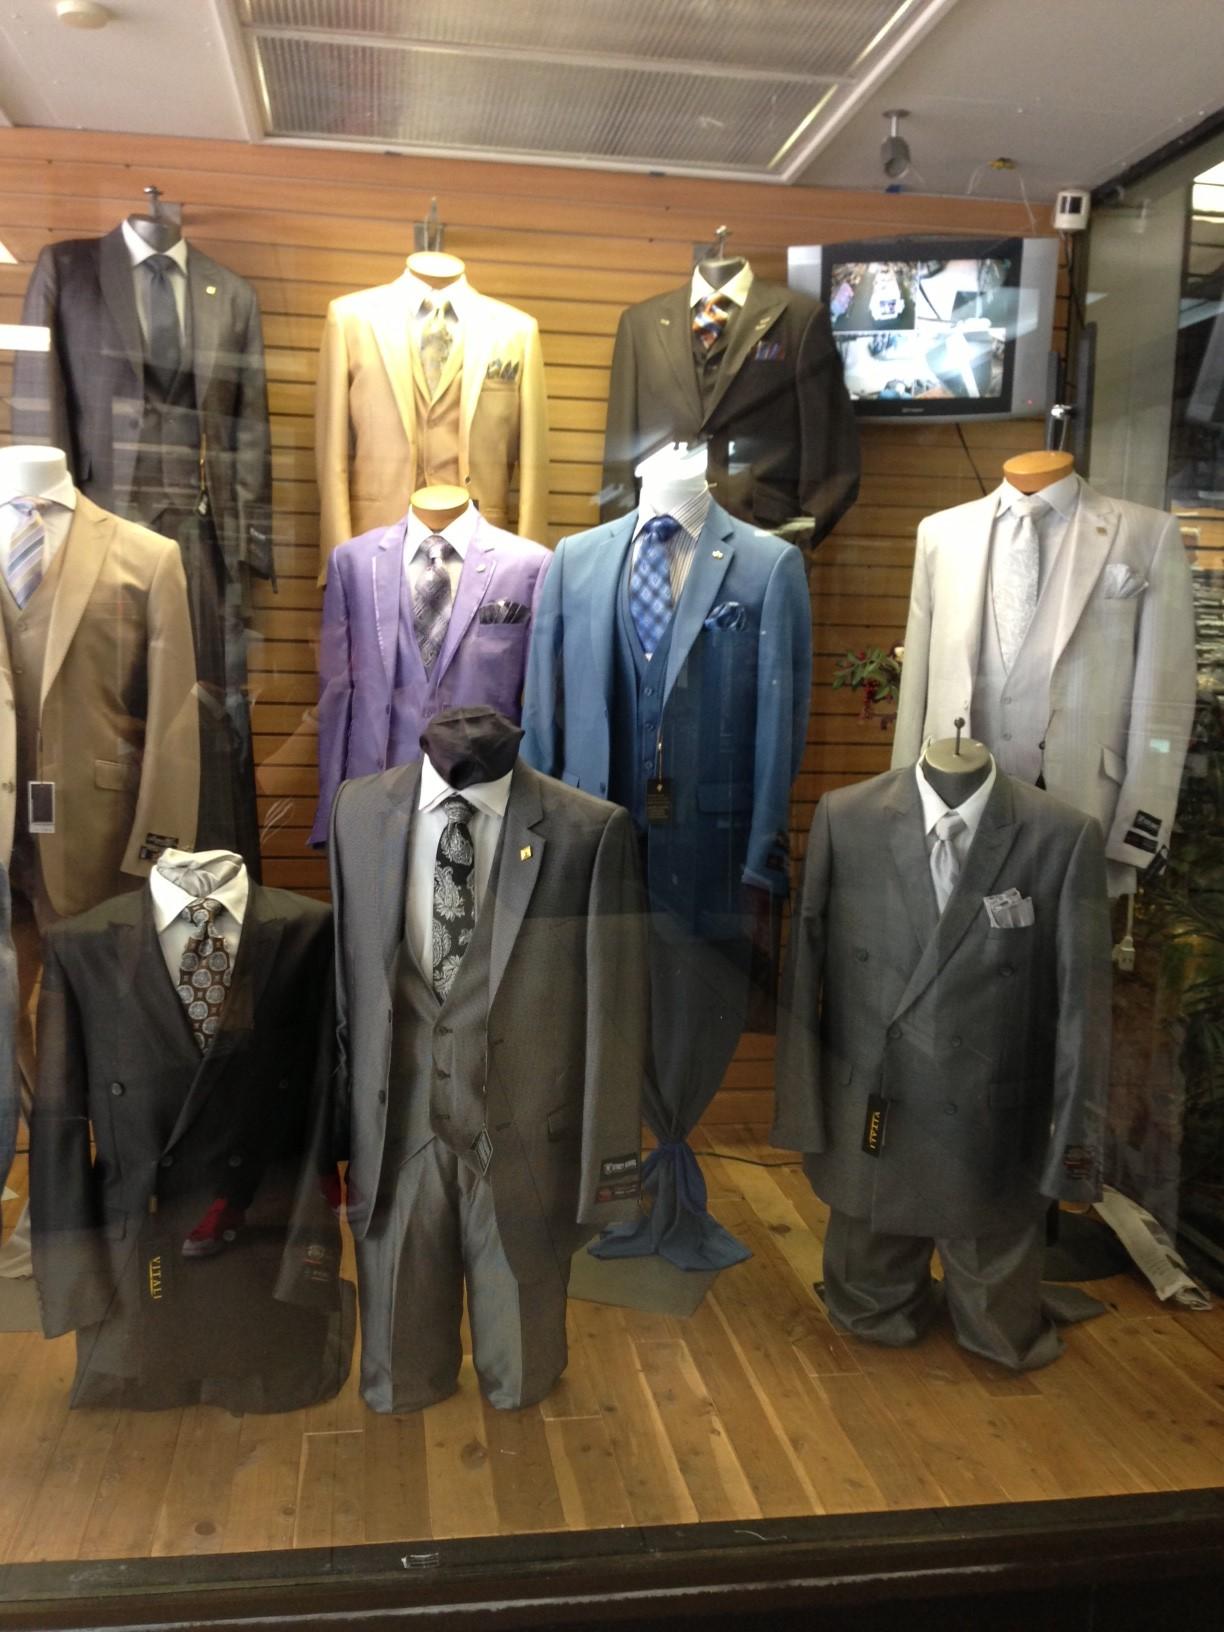 Giorgio Men's Warehouse 704 Market St, Chattanooga, TN 37402 - YP com